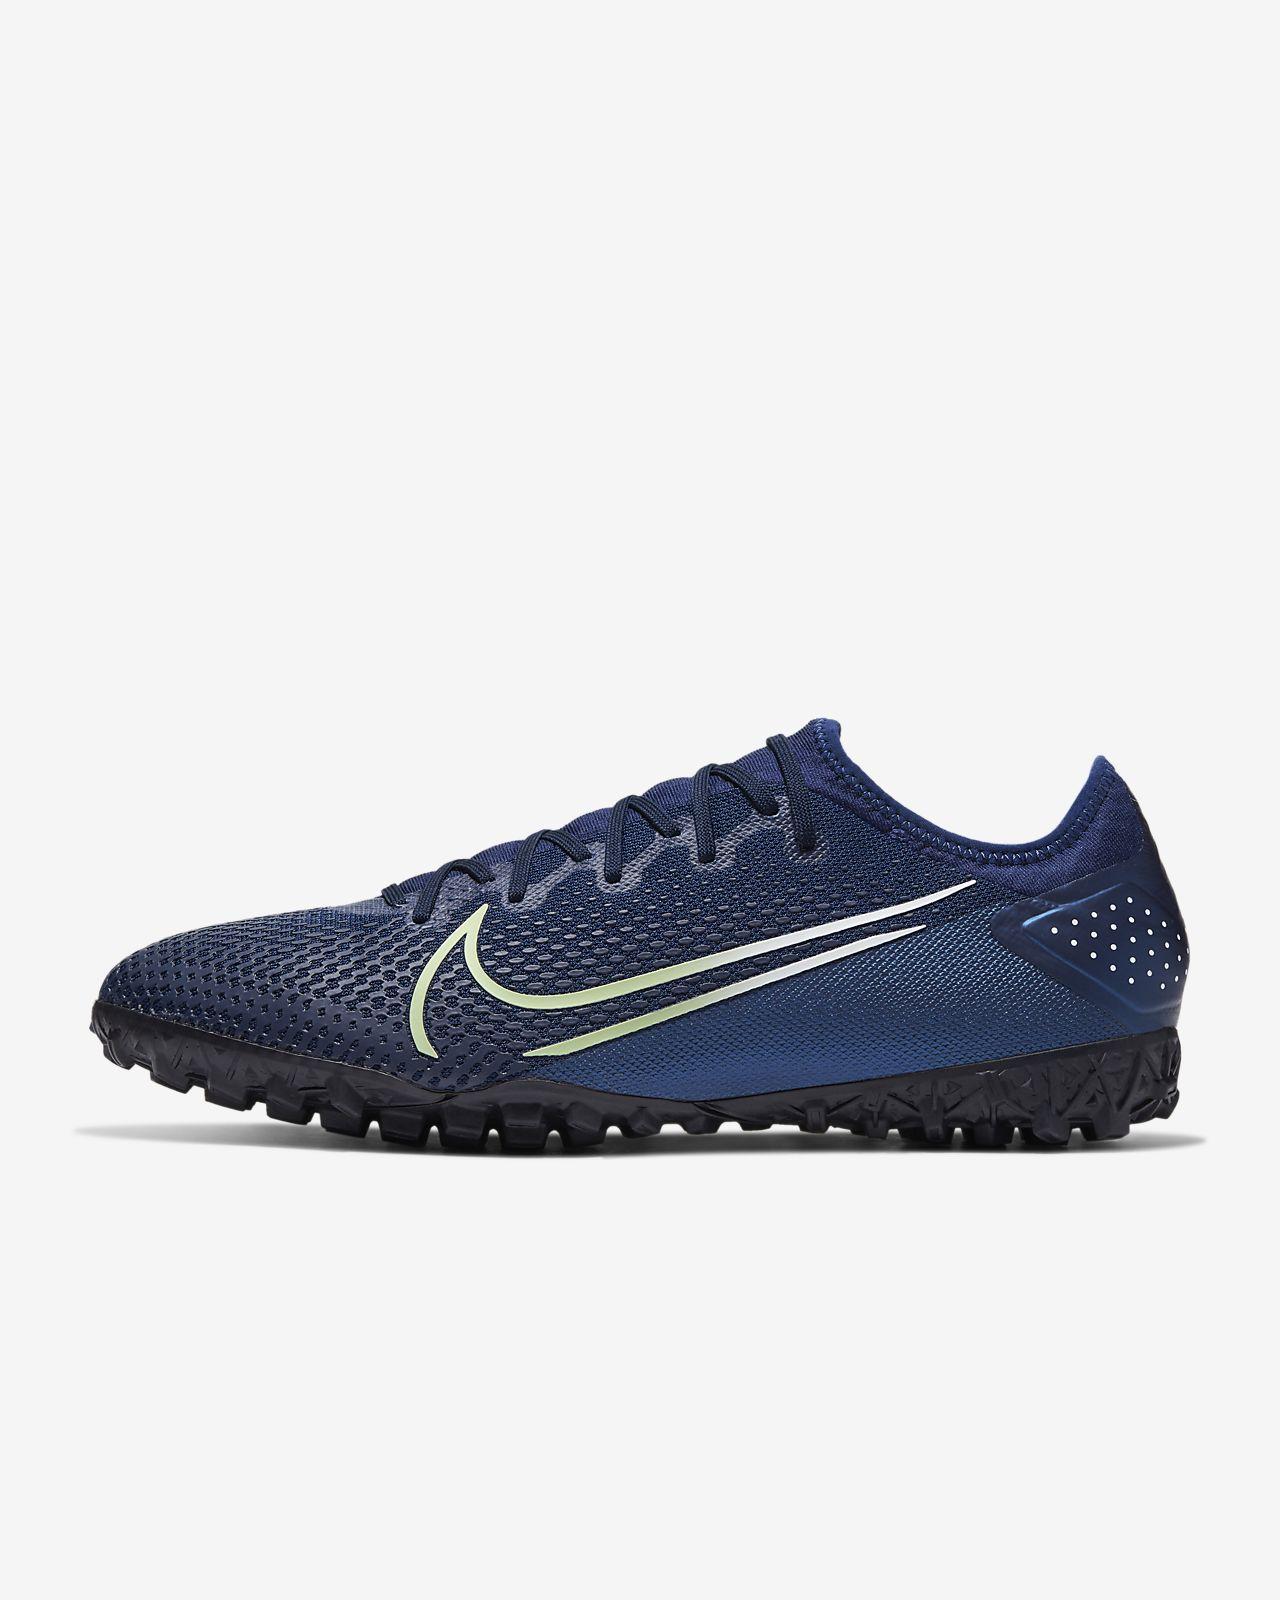 Nike Mercurial Vapor 13 Pro MDS TF-fodboldsko til grus